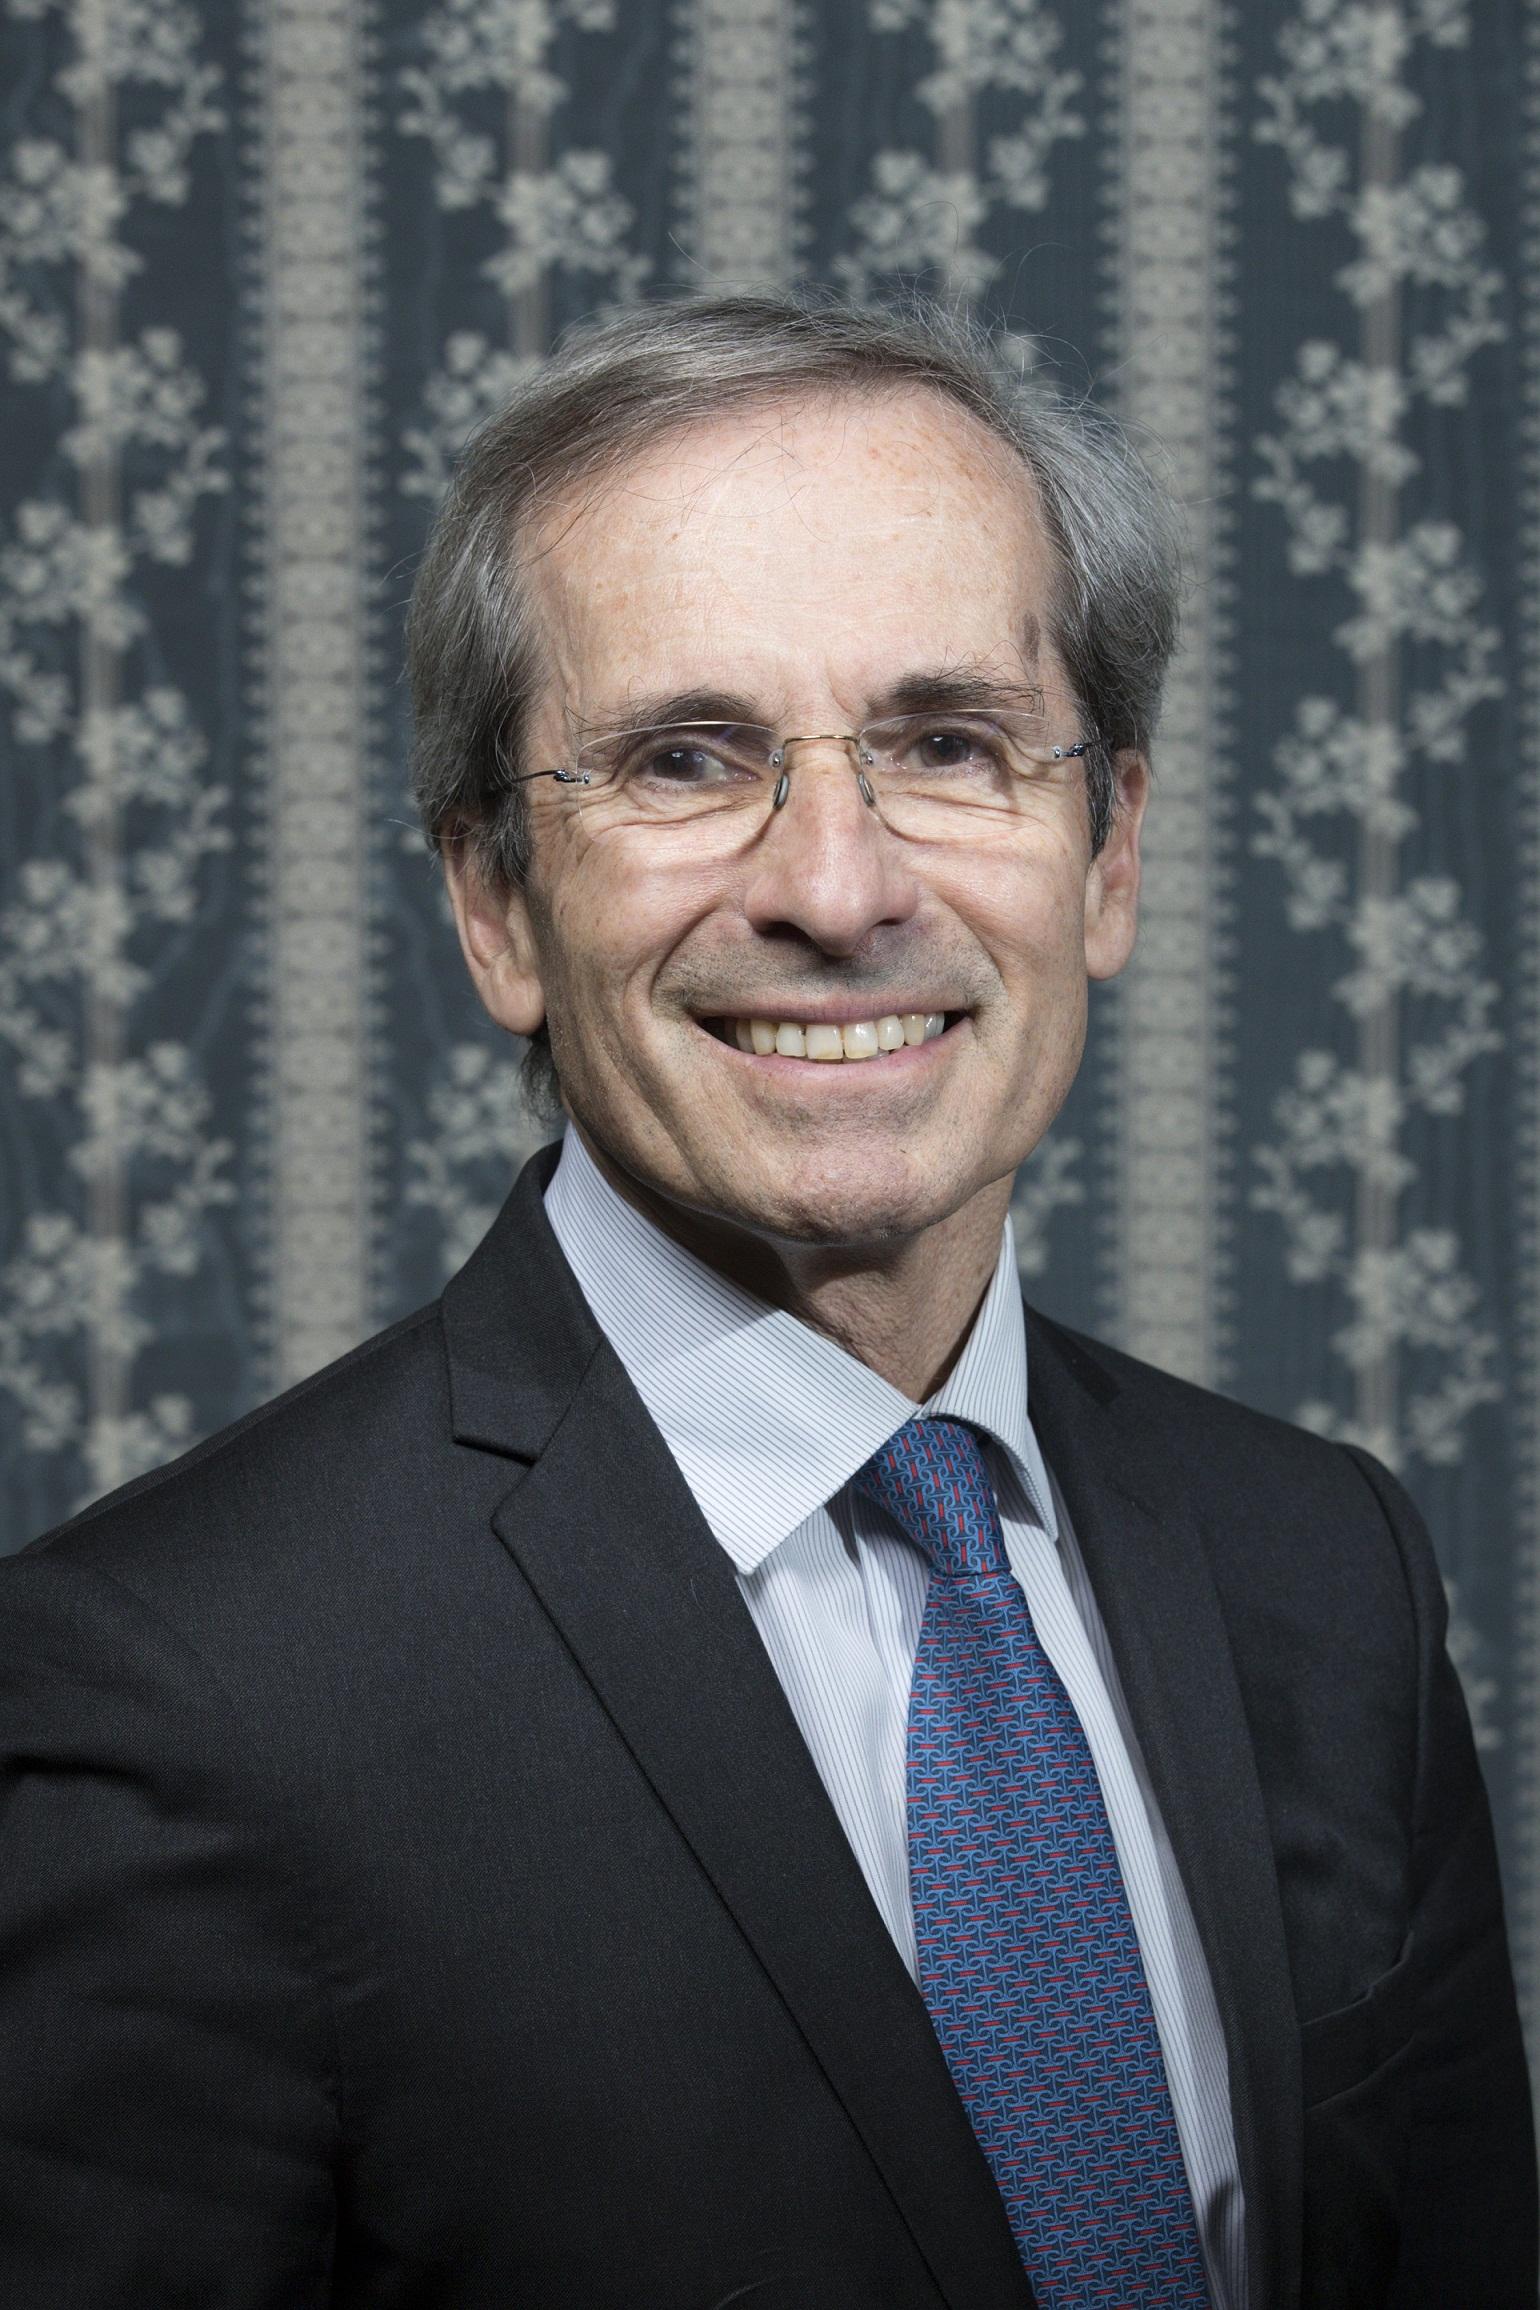 Yves Saint Geours